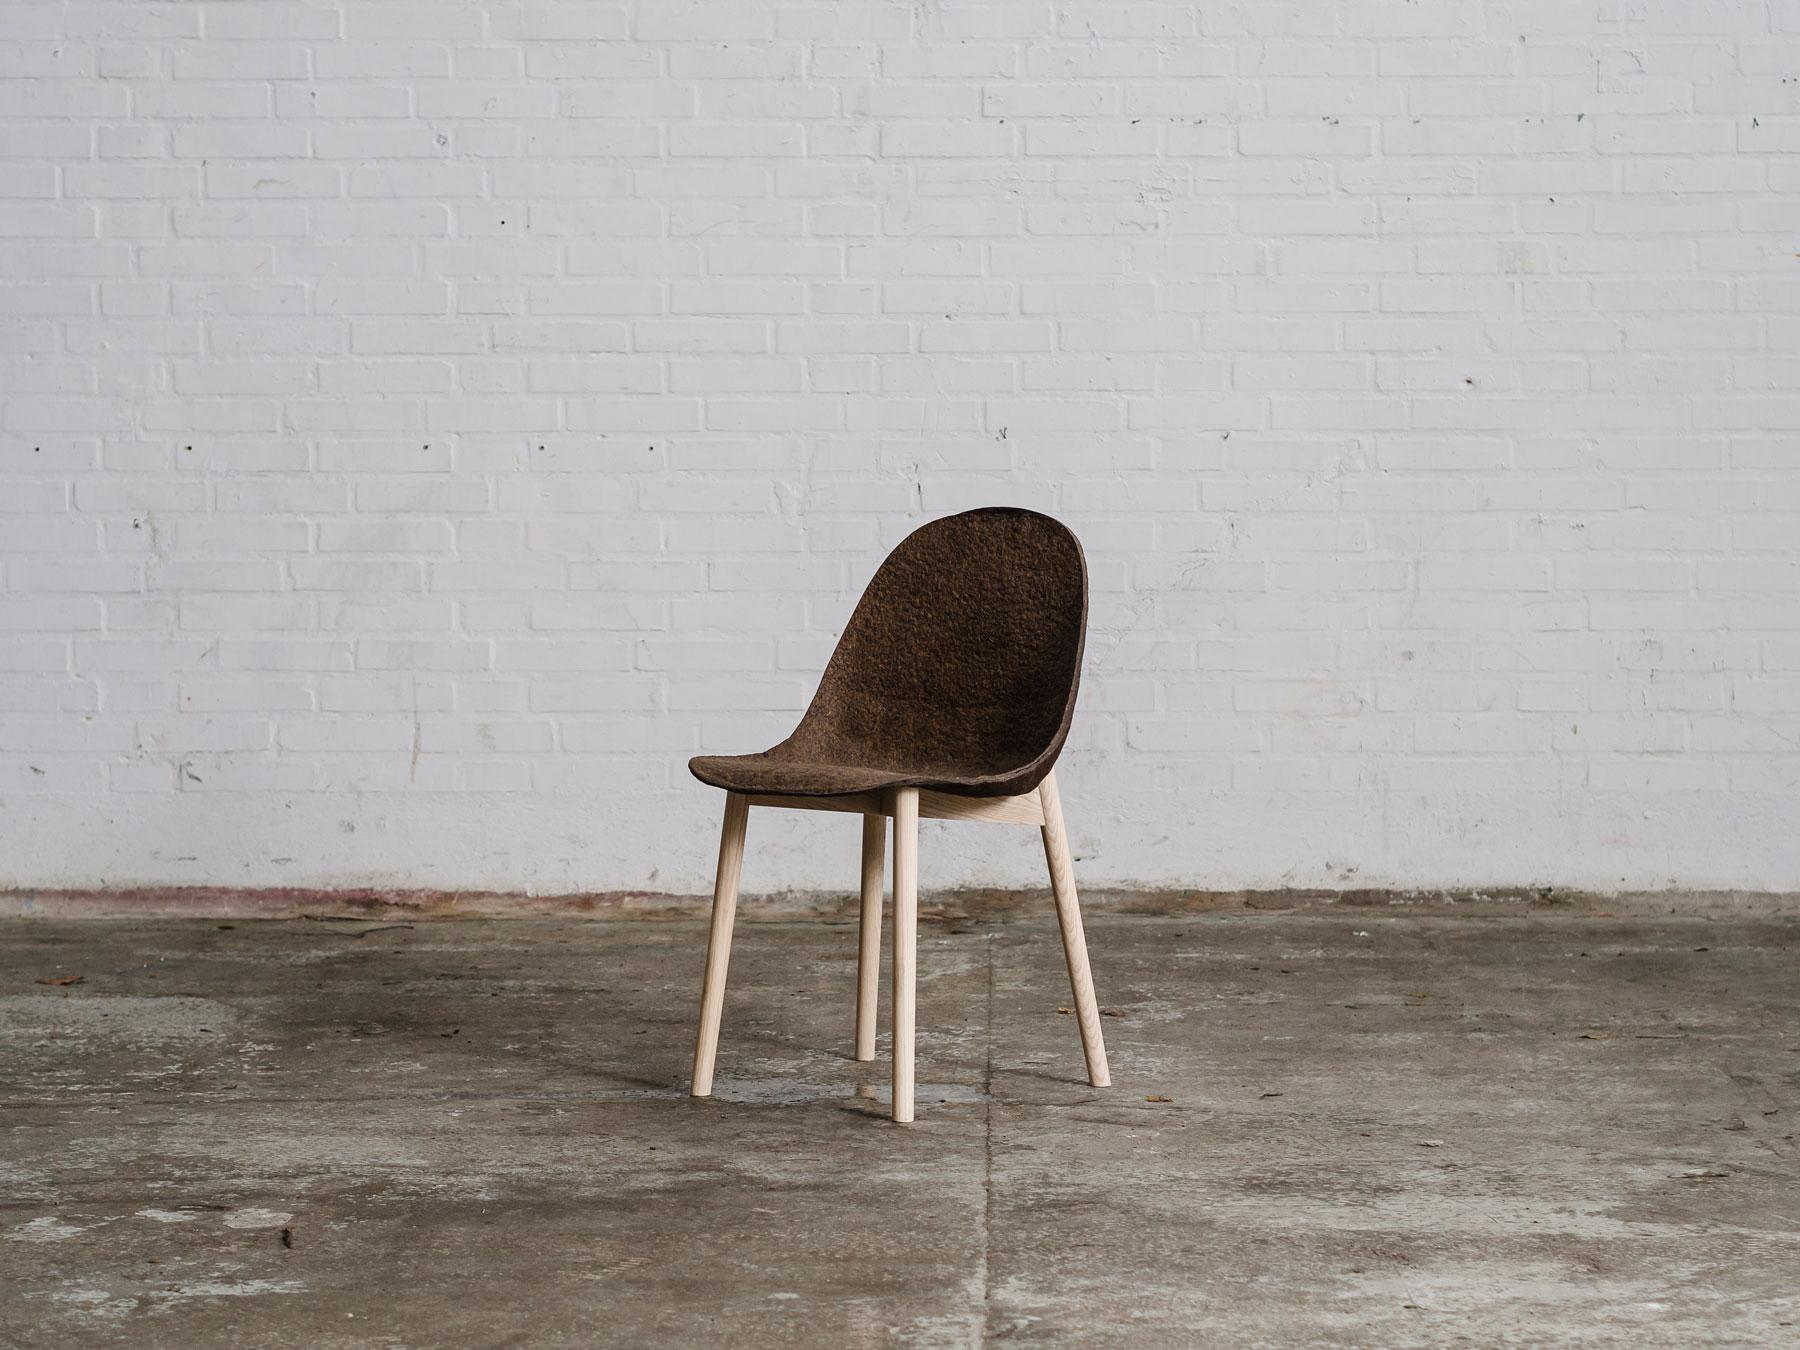 Chair made of Seaweed and Paper by Jonas Edvard and Nikolaj Steenfatt